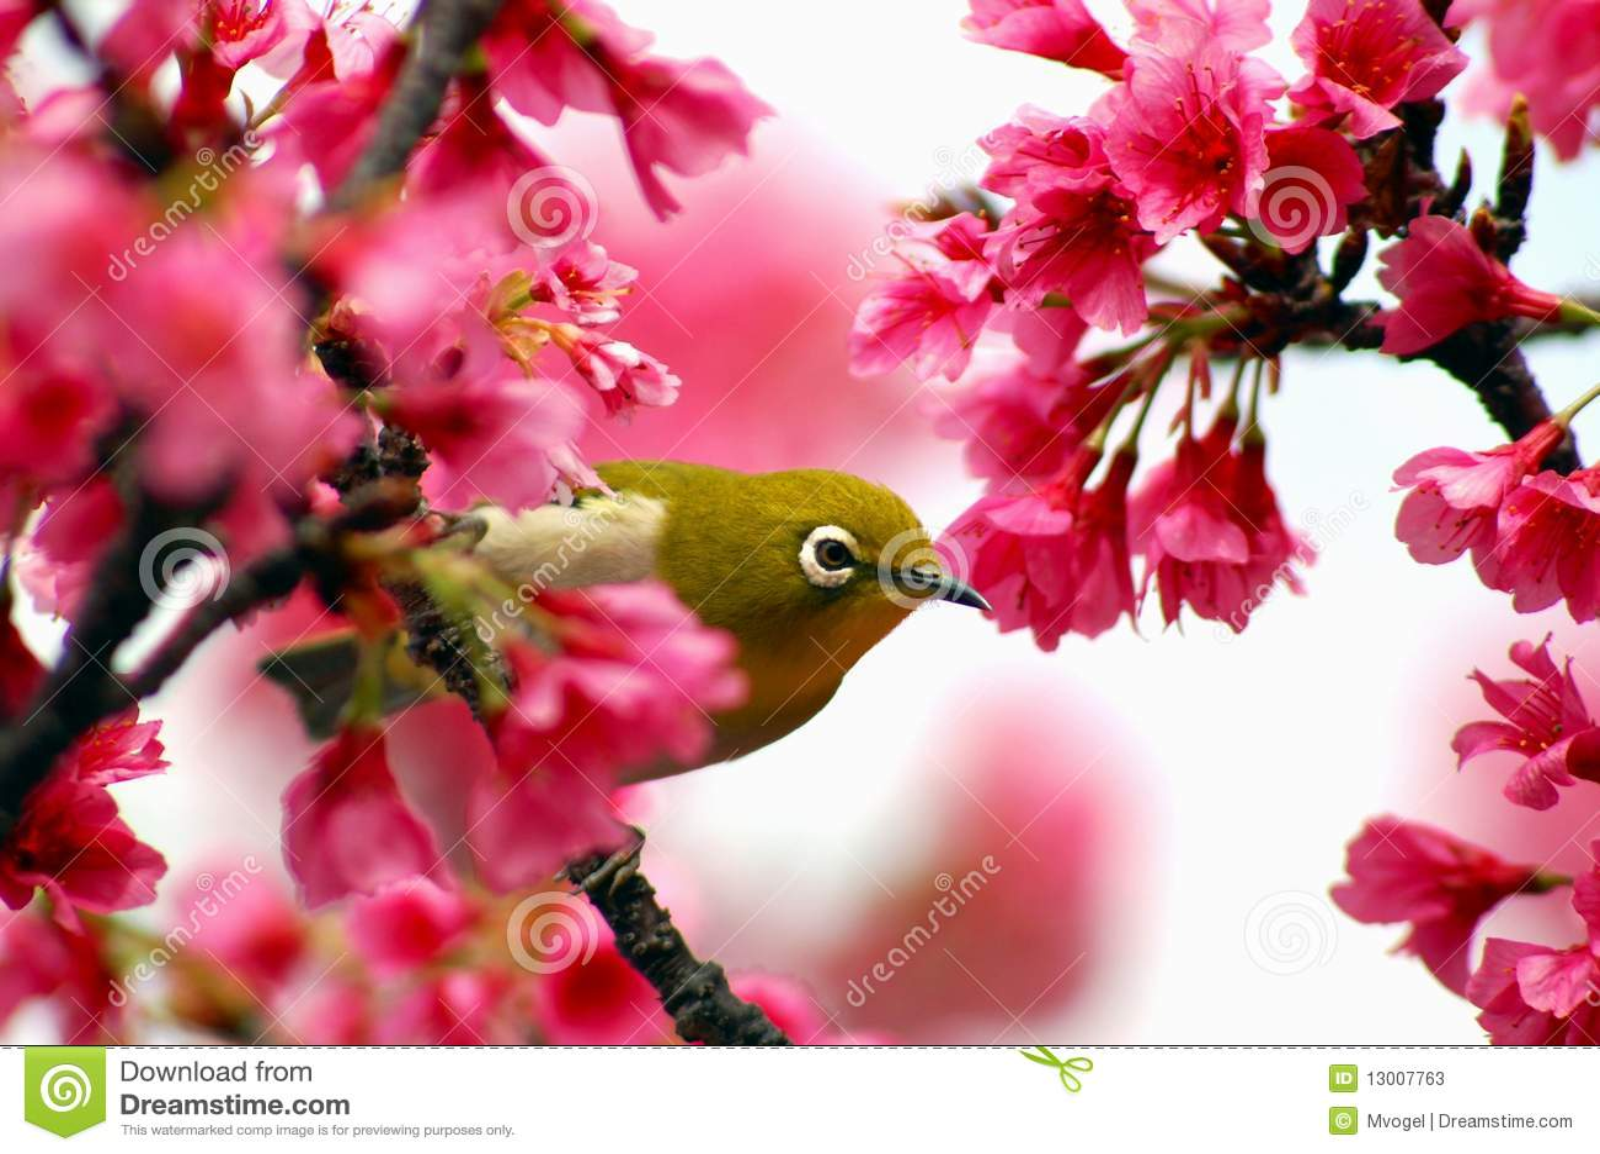 Japanese White Eye on a Cherry Blossom Tree